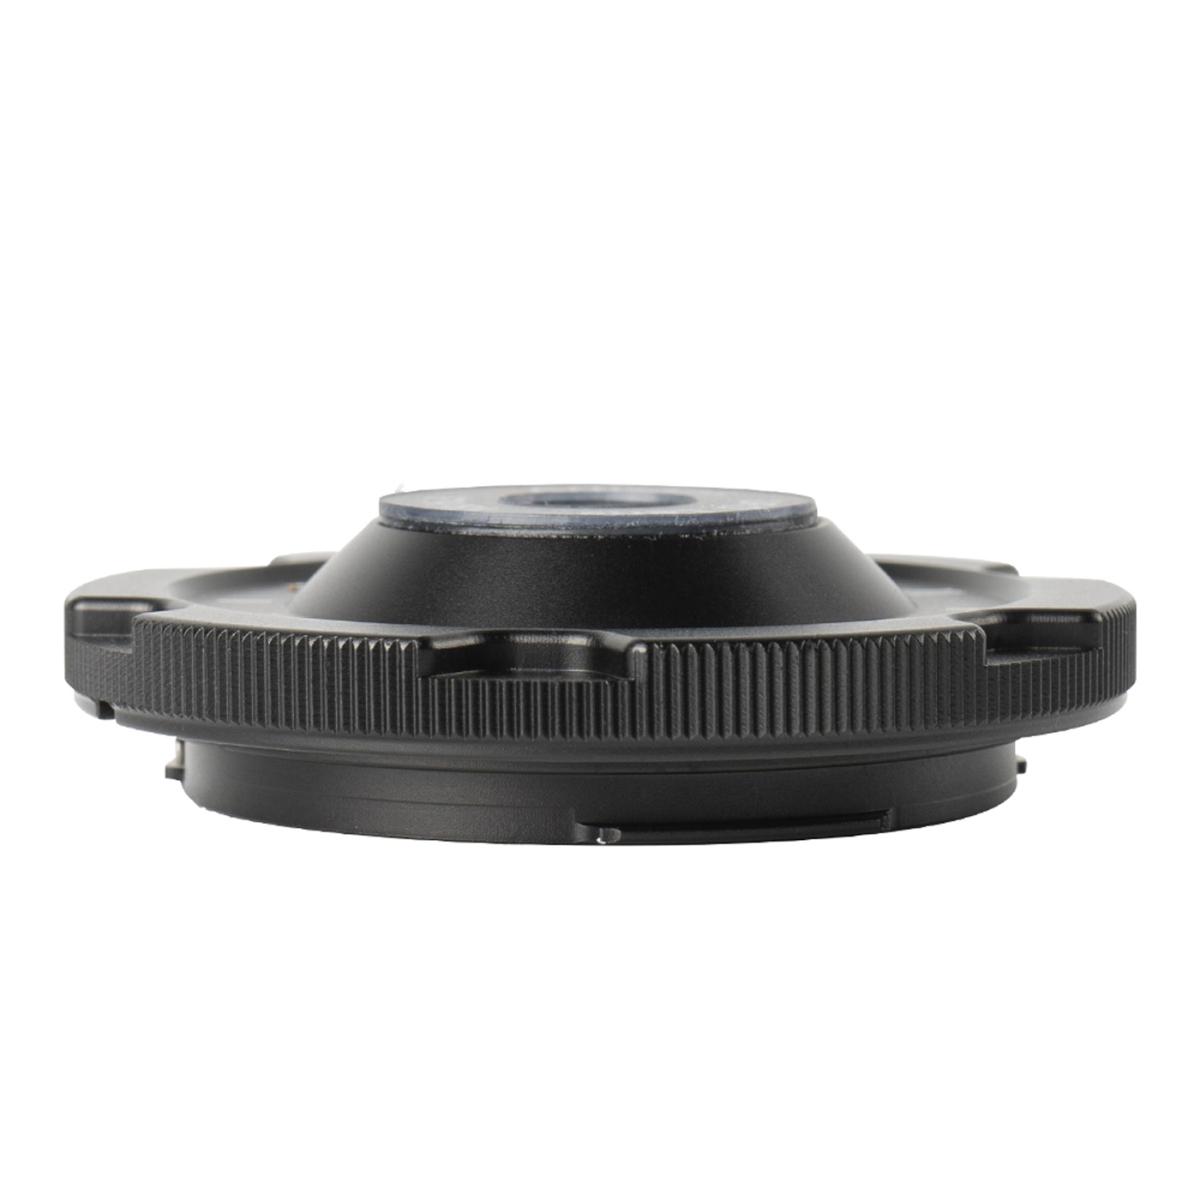 7Artisans 18 mm 1:6,3 UFO Sony E-Mount